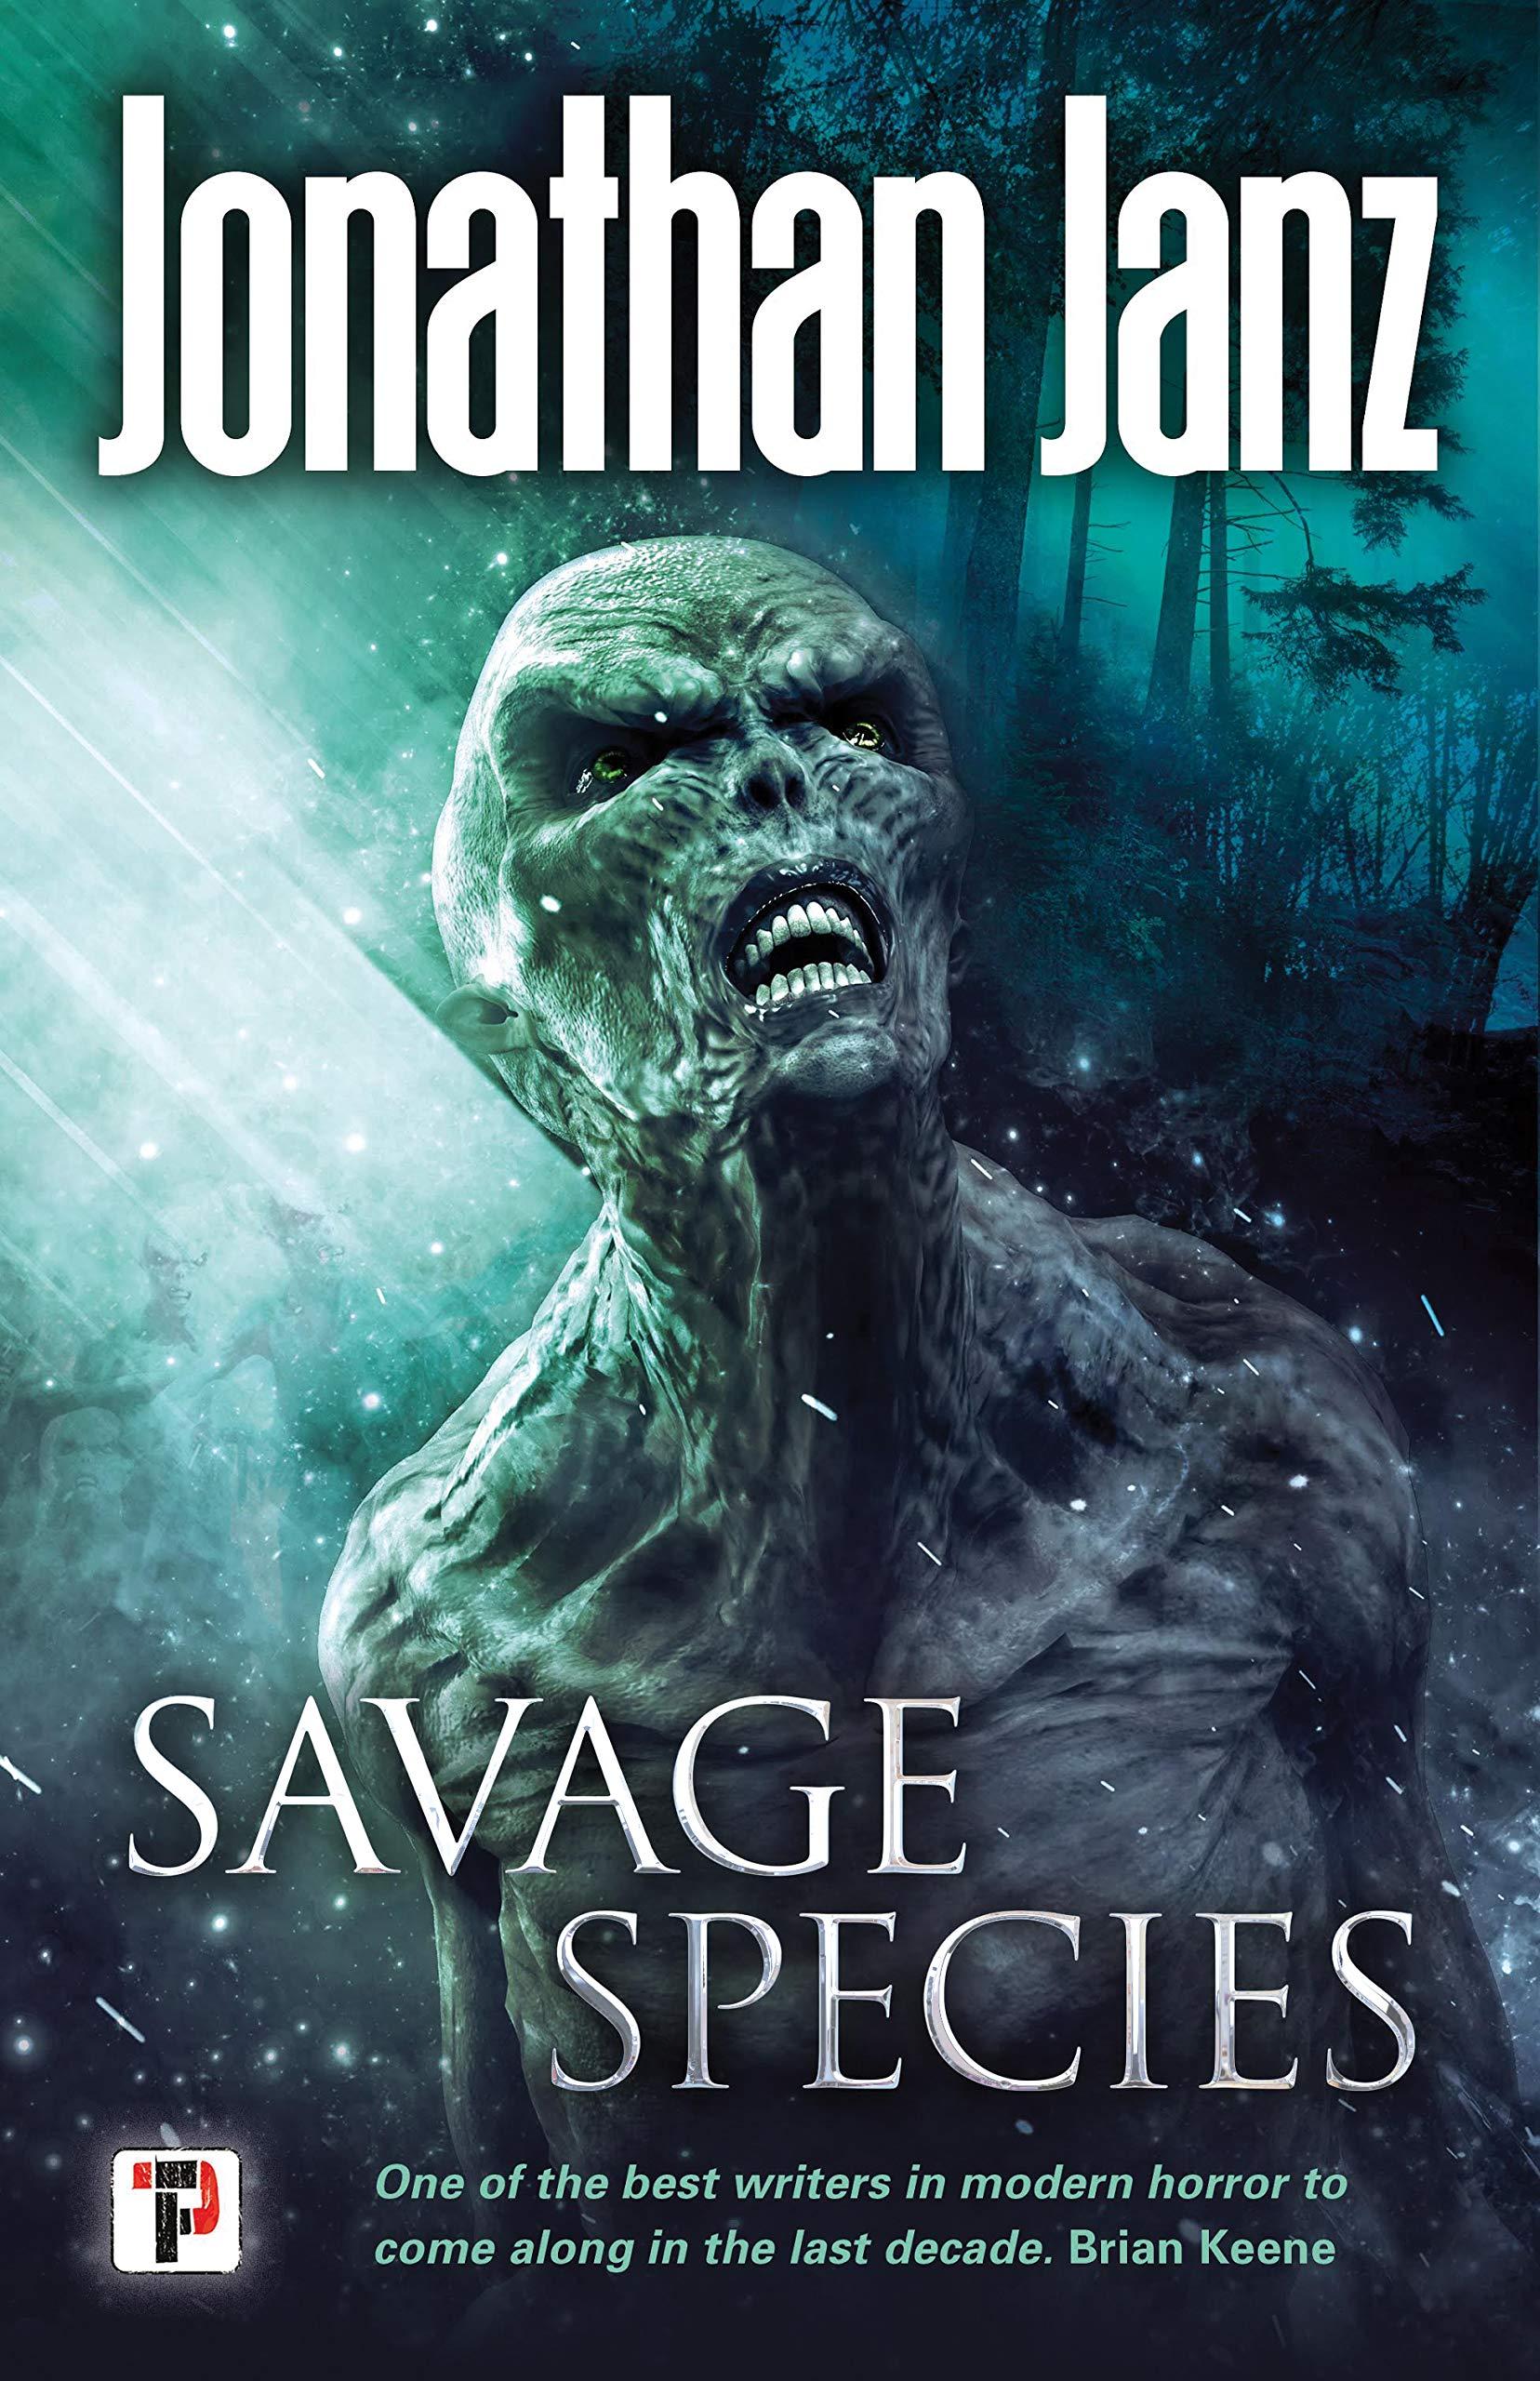 Savage Species_Jonathan Janz.jpg